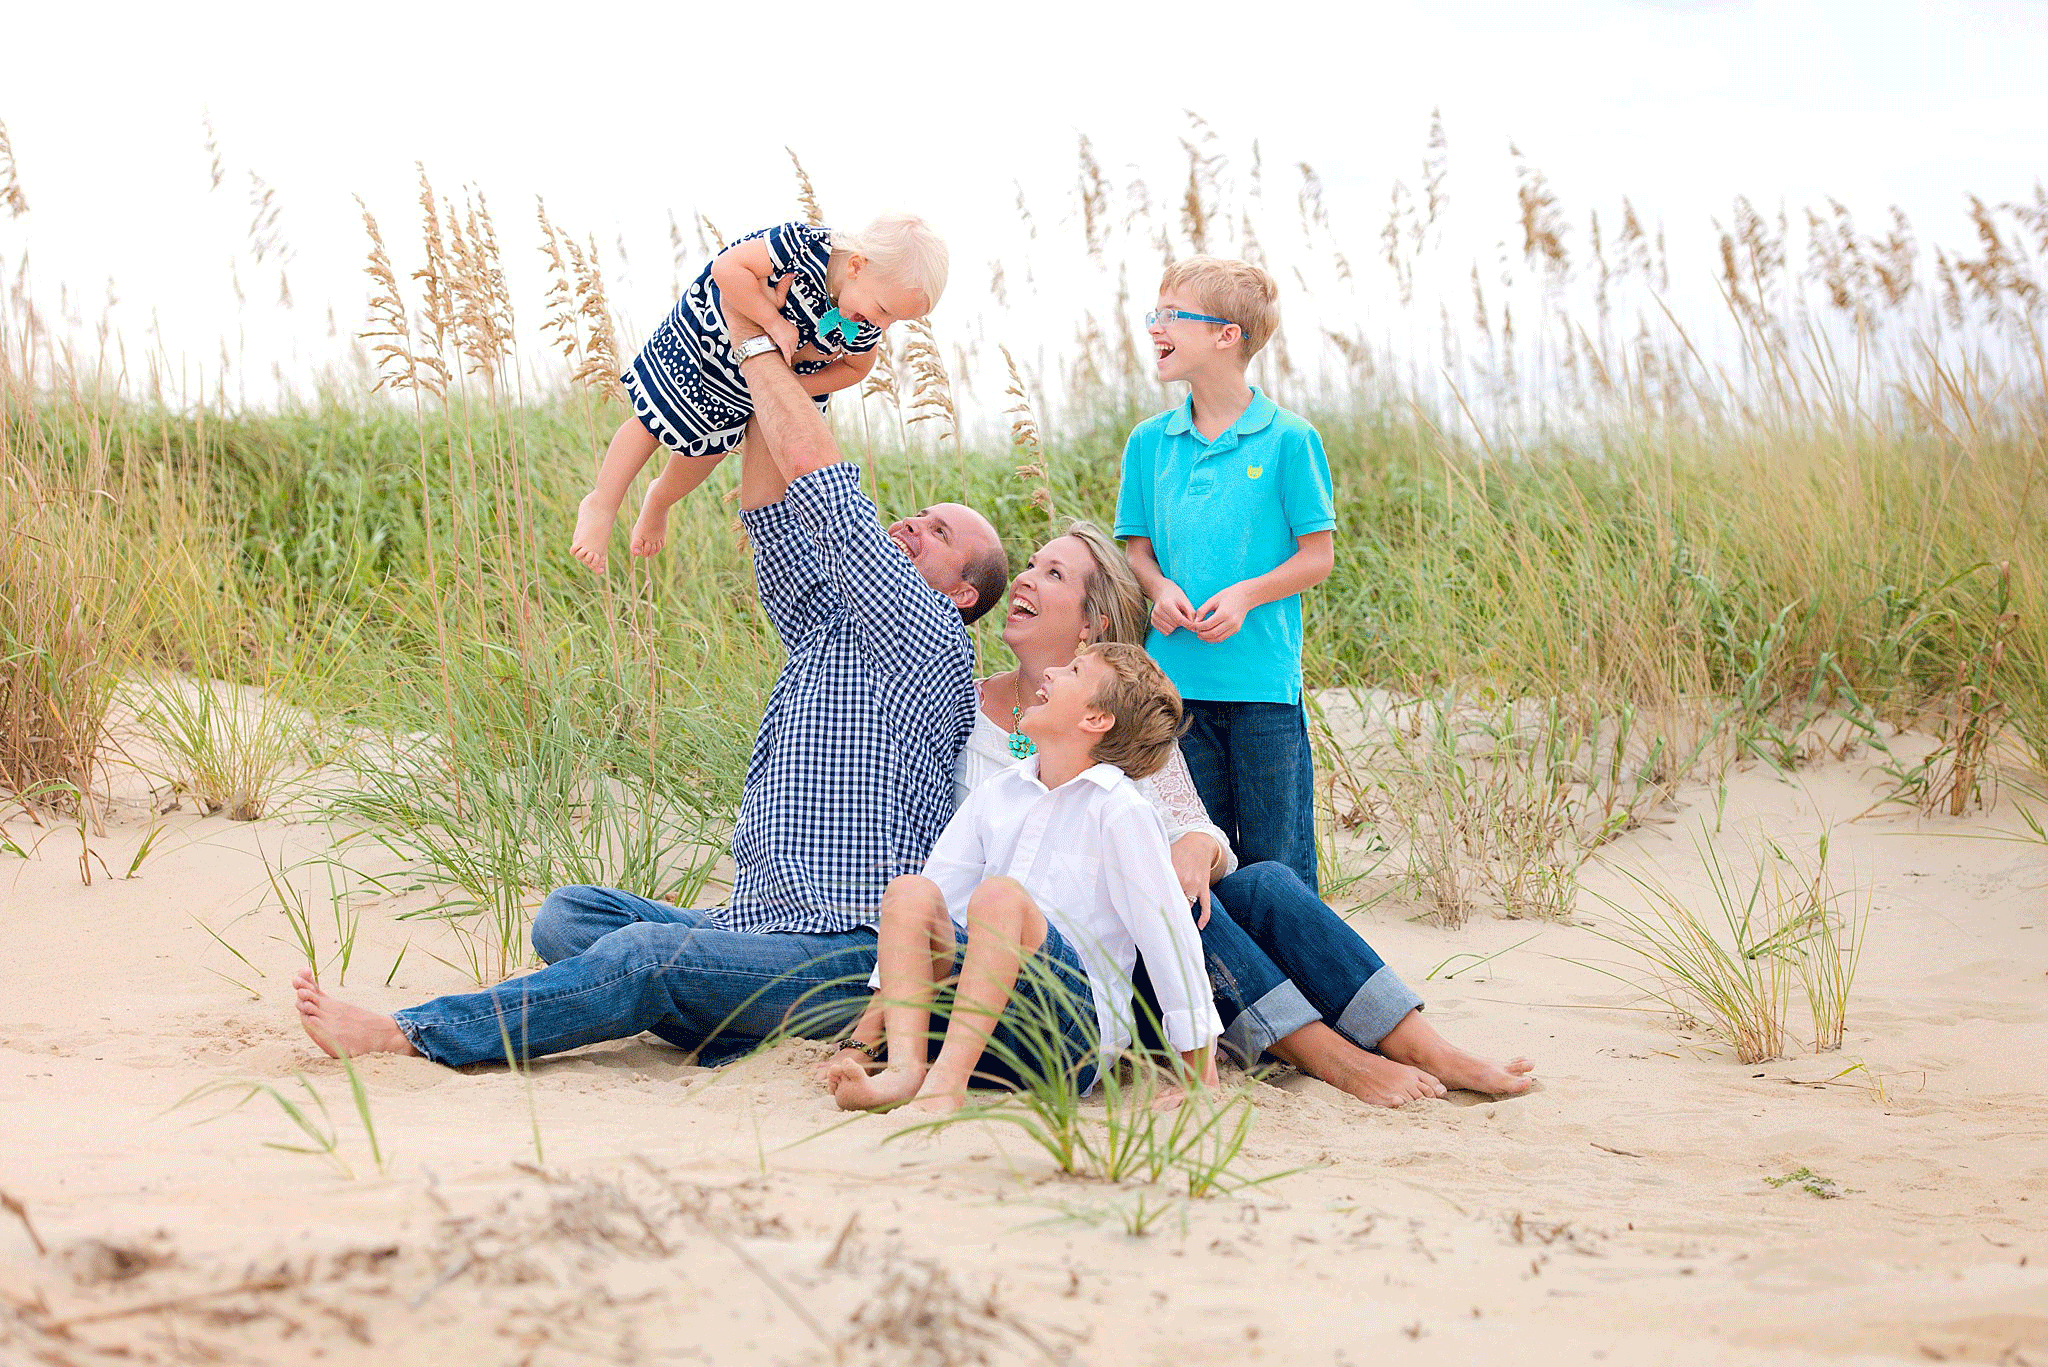 sandbridge-photographers-virginia-beach-photographer-melissa-bliss-photography-family-beach-photos-lifestyle-photography-family-session.png